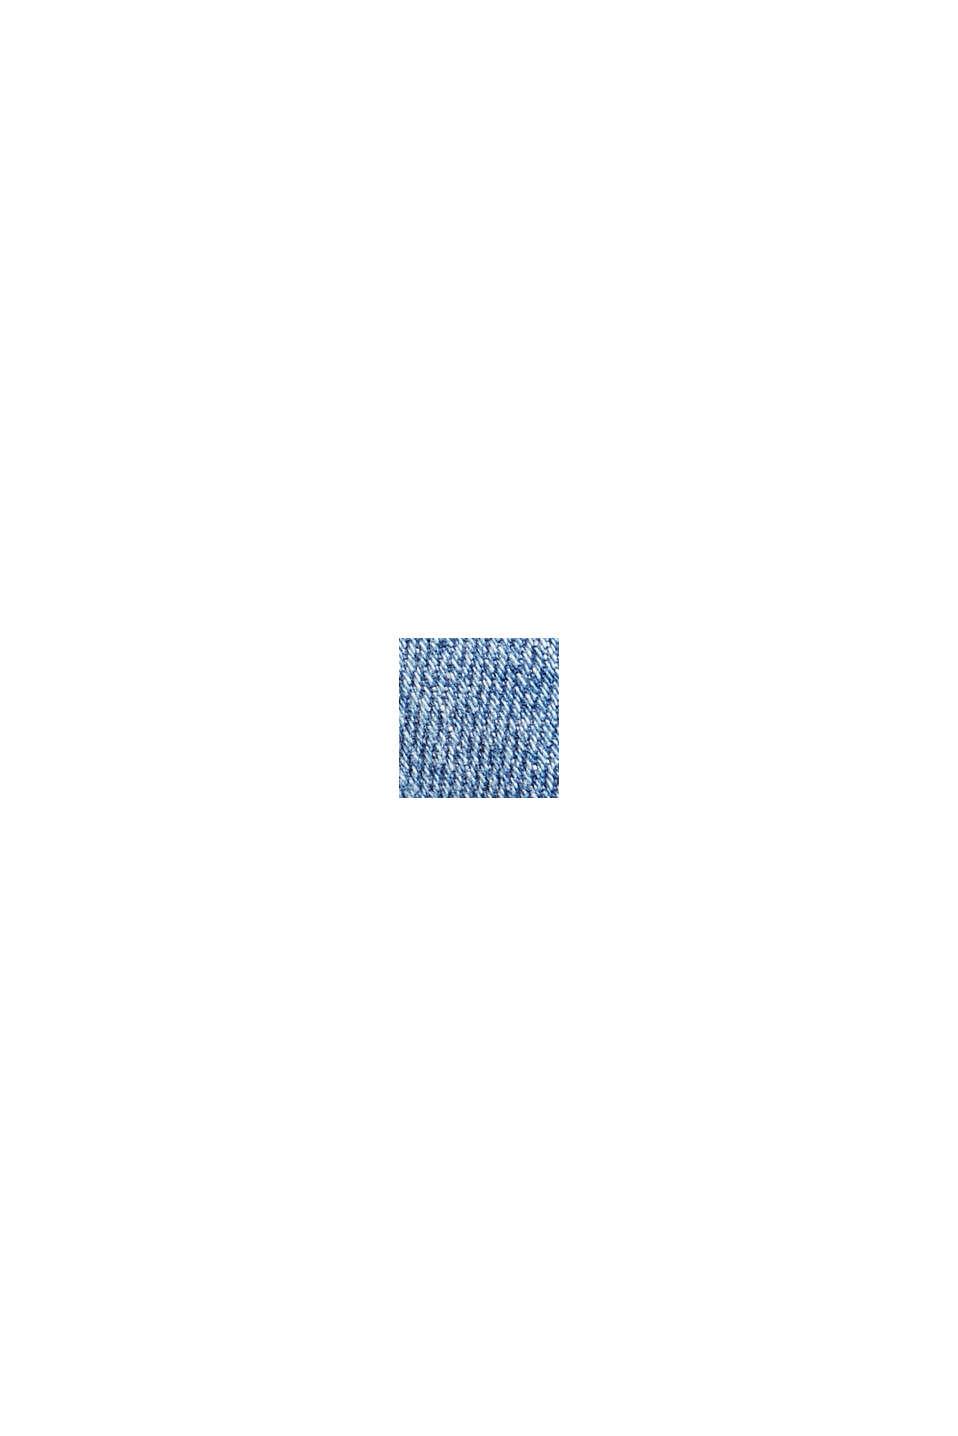 Pants denim straight cropped, BLUE MEDIUM WASHED, swatch